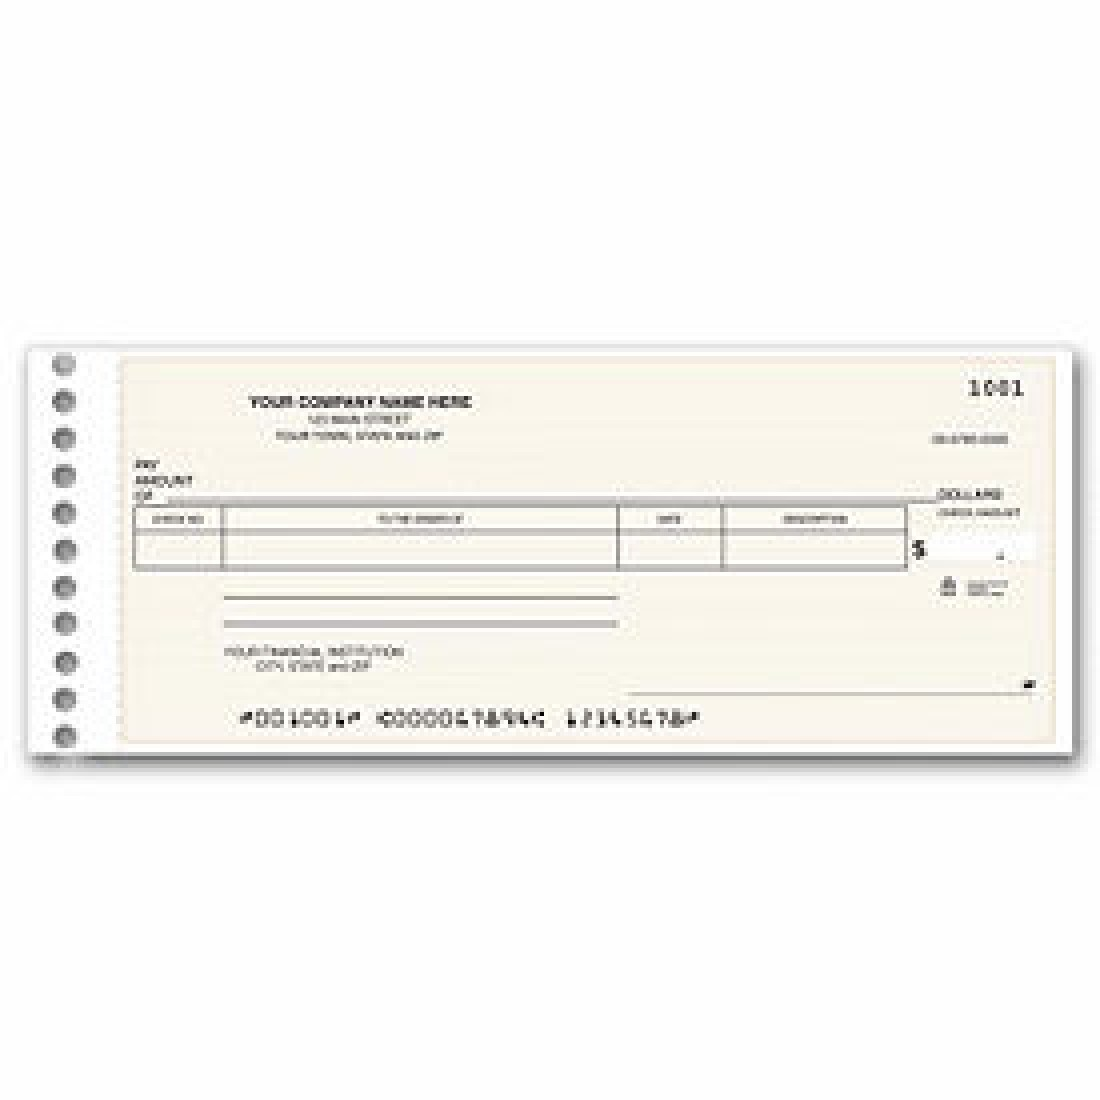 Compact General Expense Check (Item # 115011N) - One-Write Checks  - Business Checks